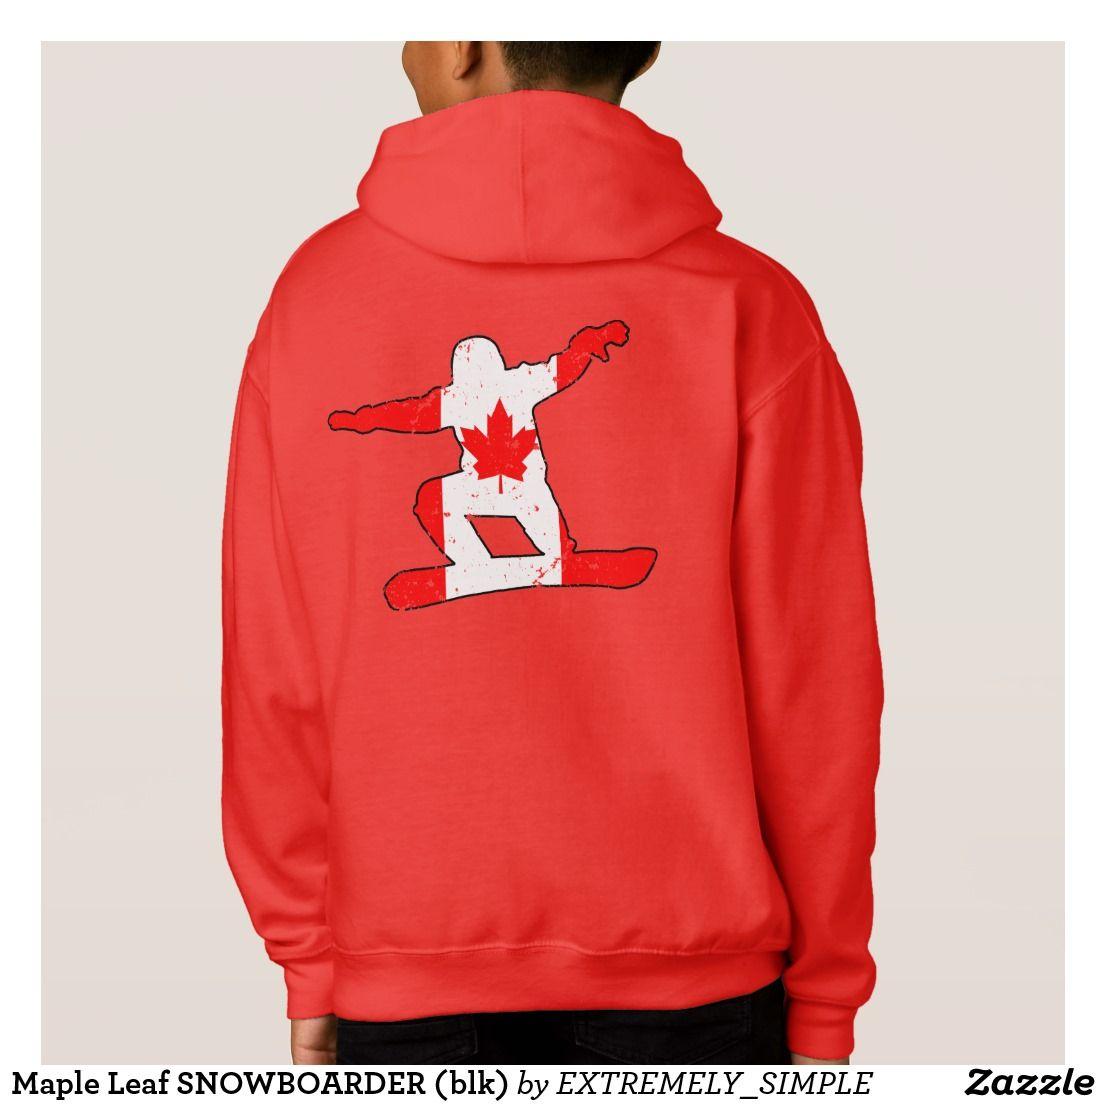 Snowboard hoodie Shredding the gnar hoody winter clothing gift hooded top